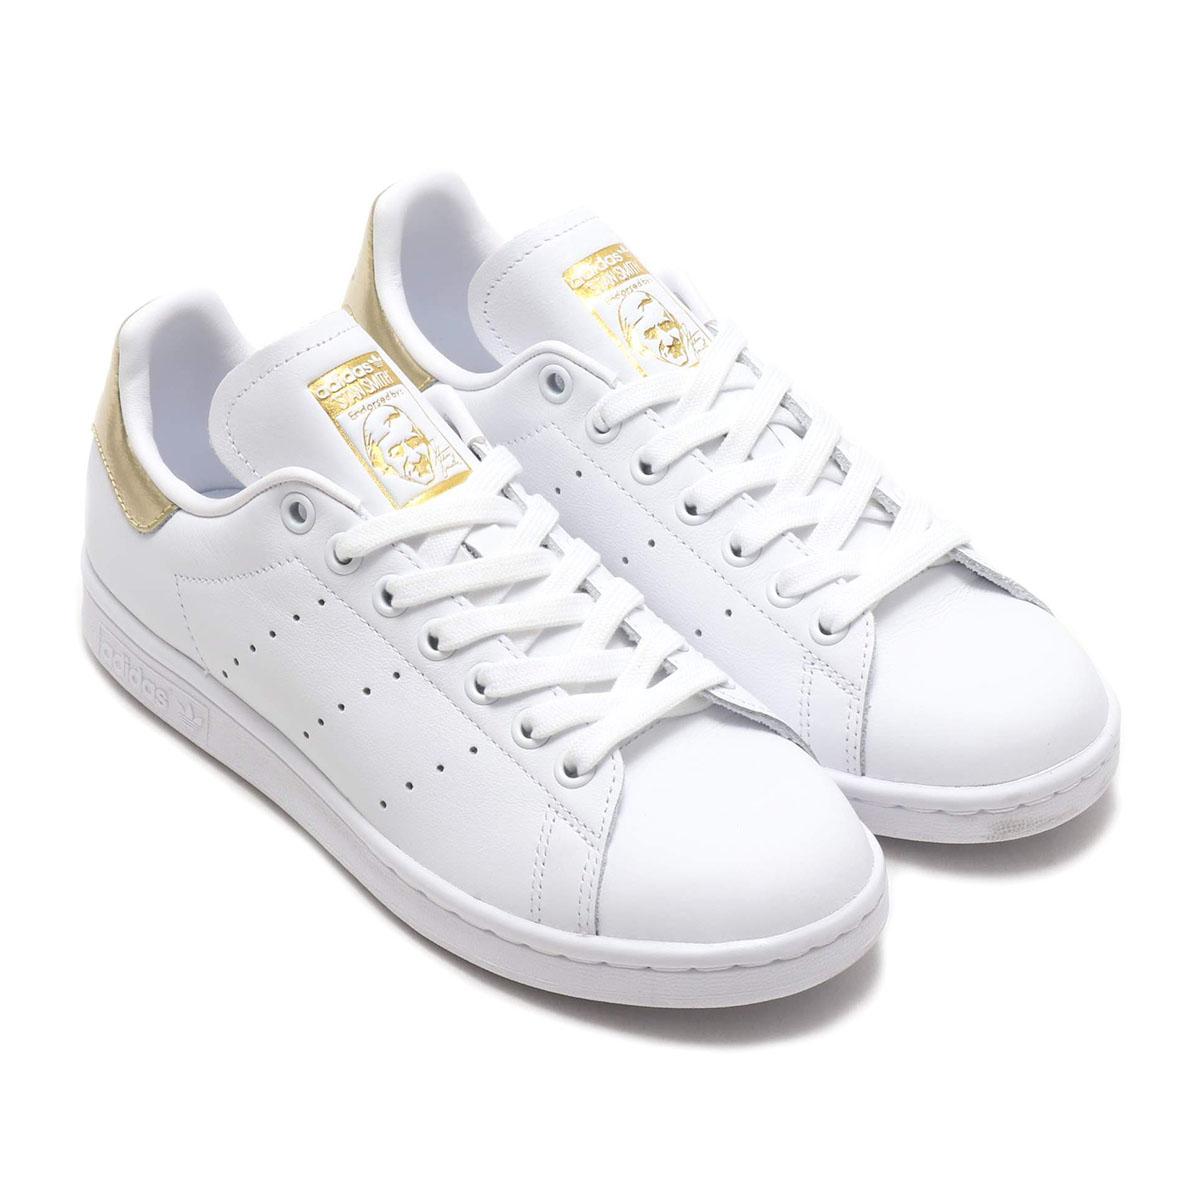 adidas Originals STAN SMITH W(RUNNING WHITE/RUNNING WHITE/GOLDMET)(アディダスオリジナルス スタンスミス W)【レディース】【スニーカー】【19SS-I】